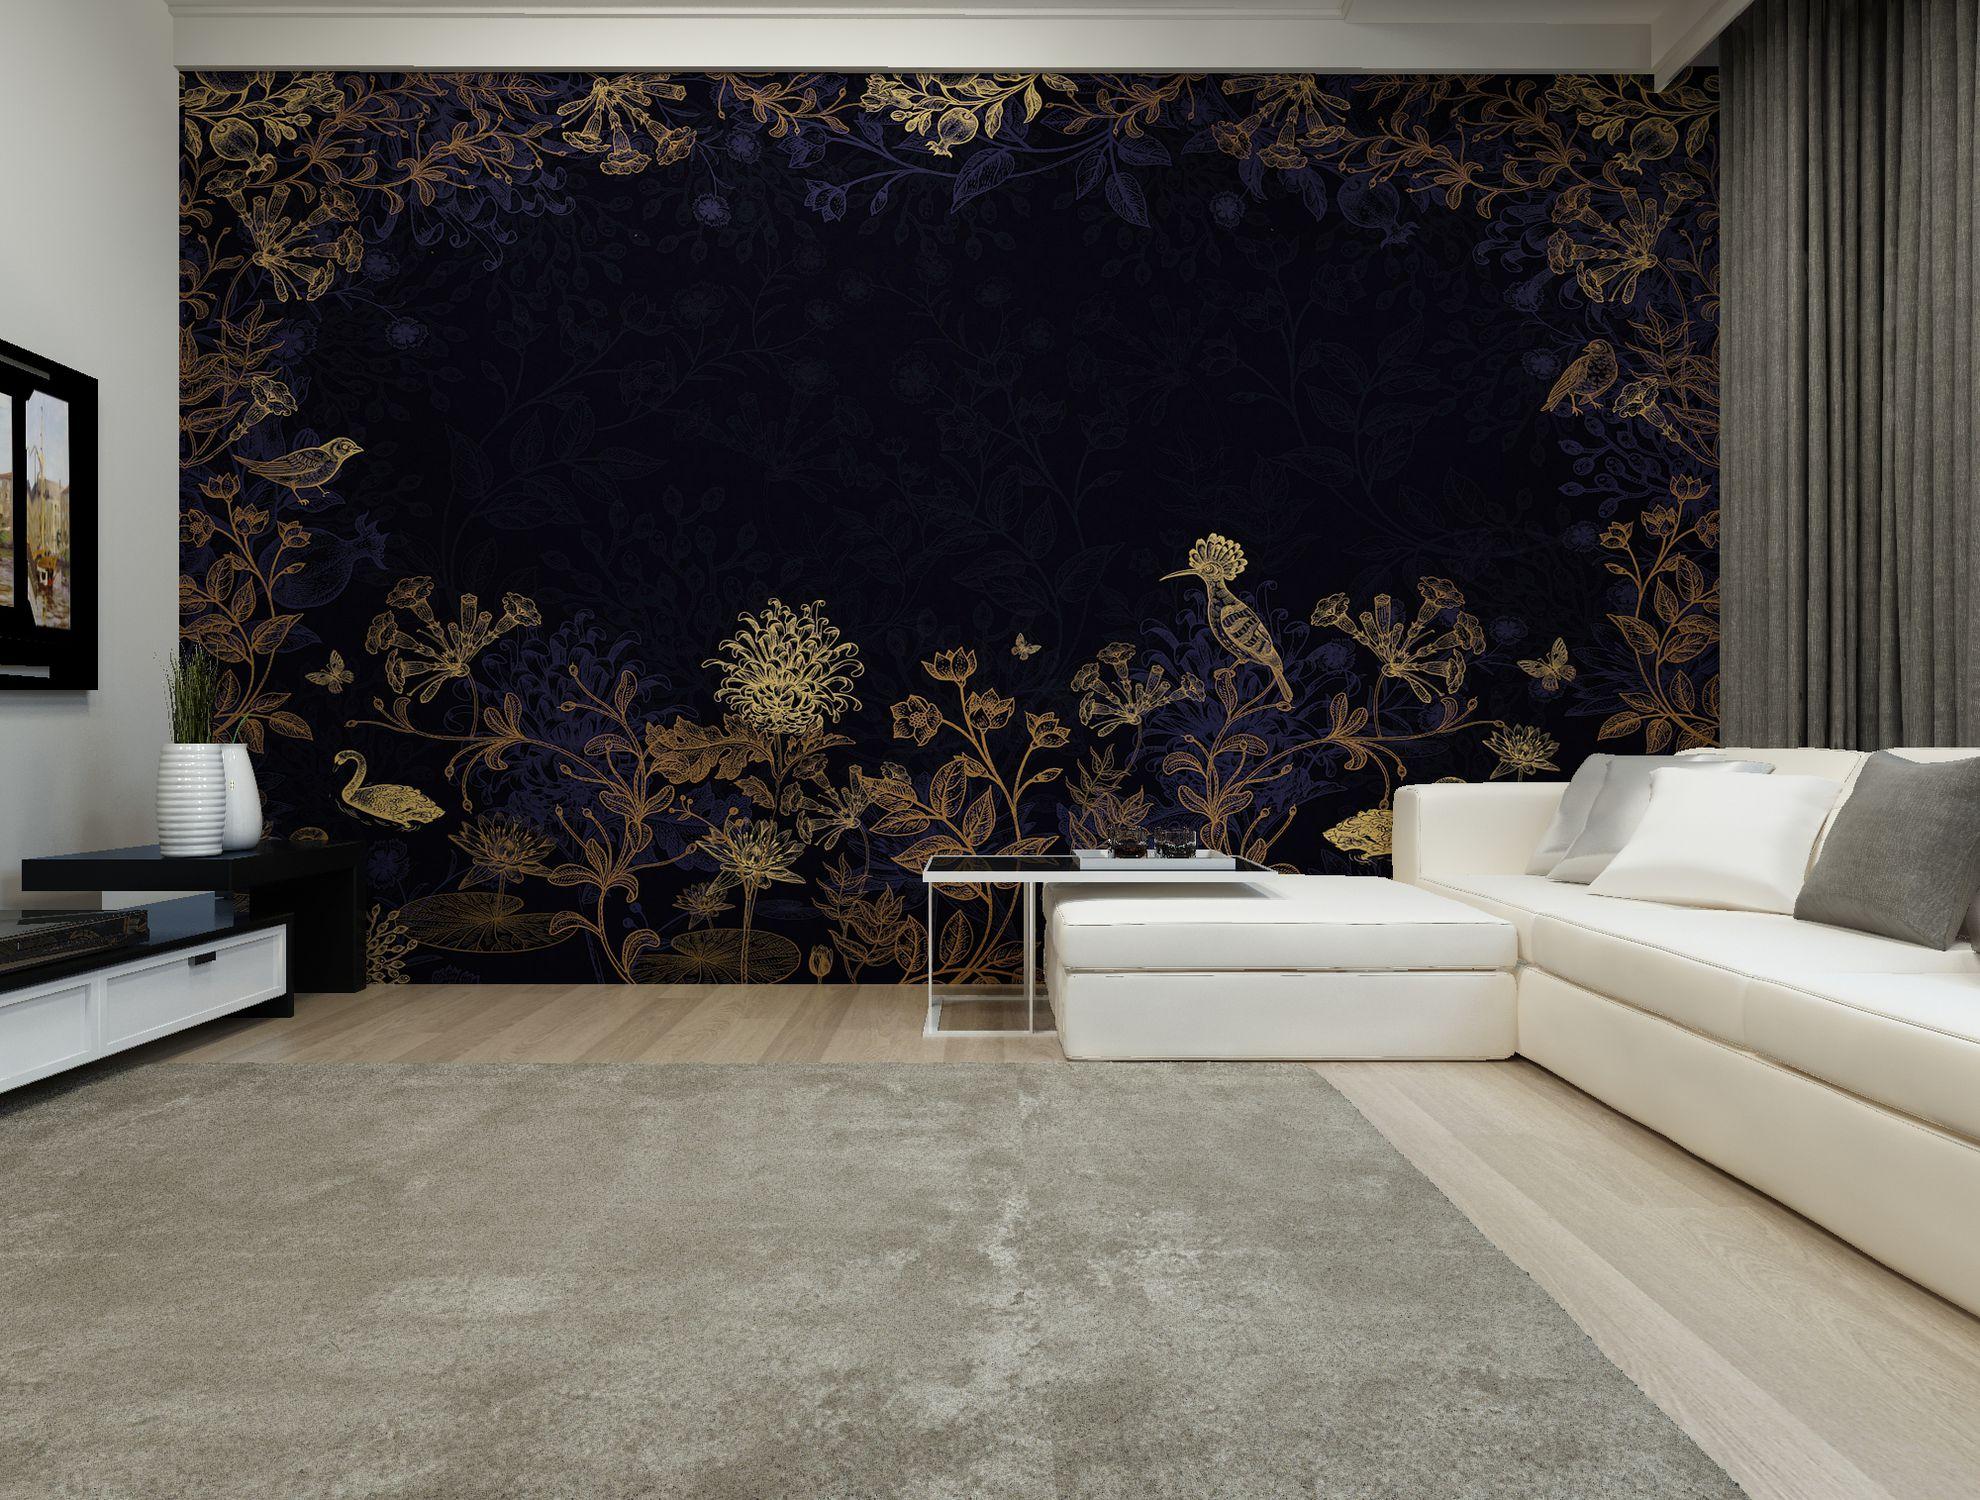 Contemporary Wallpaper Hd912a Glow In The Dark Hd Walls